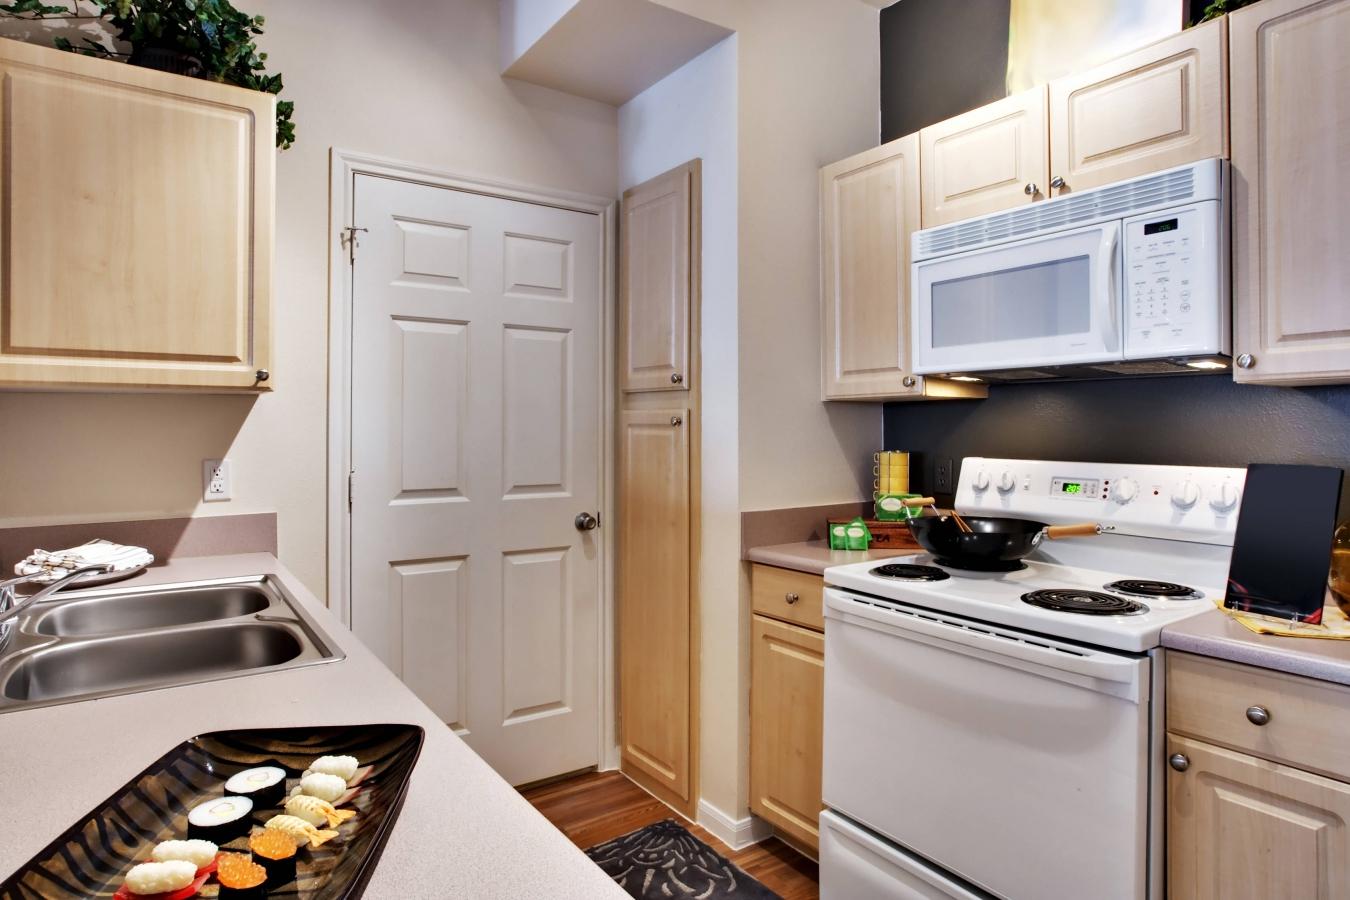 мойка и холодильник на кухне